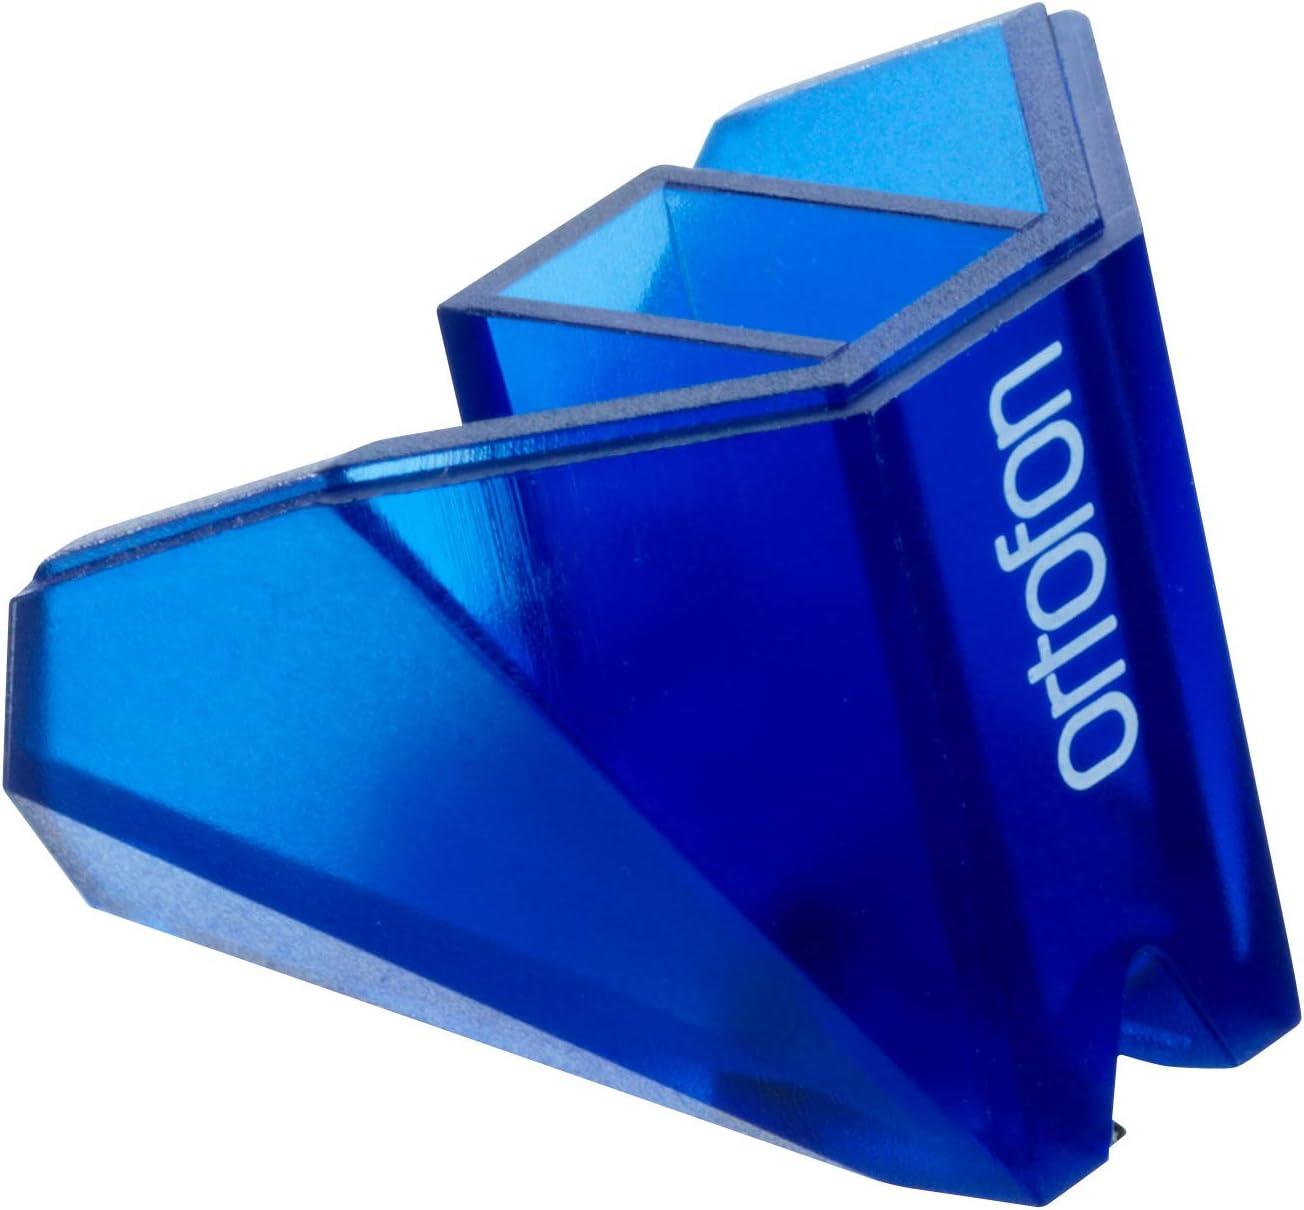 Ortofon Stylus 2M Blue - Aguja: Amazon.es: Electrónica